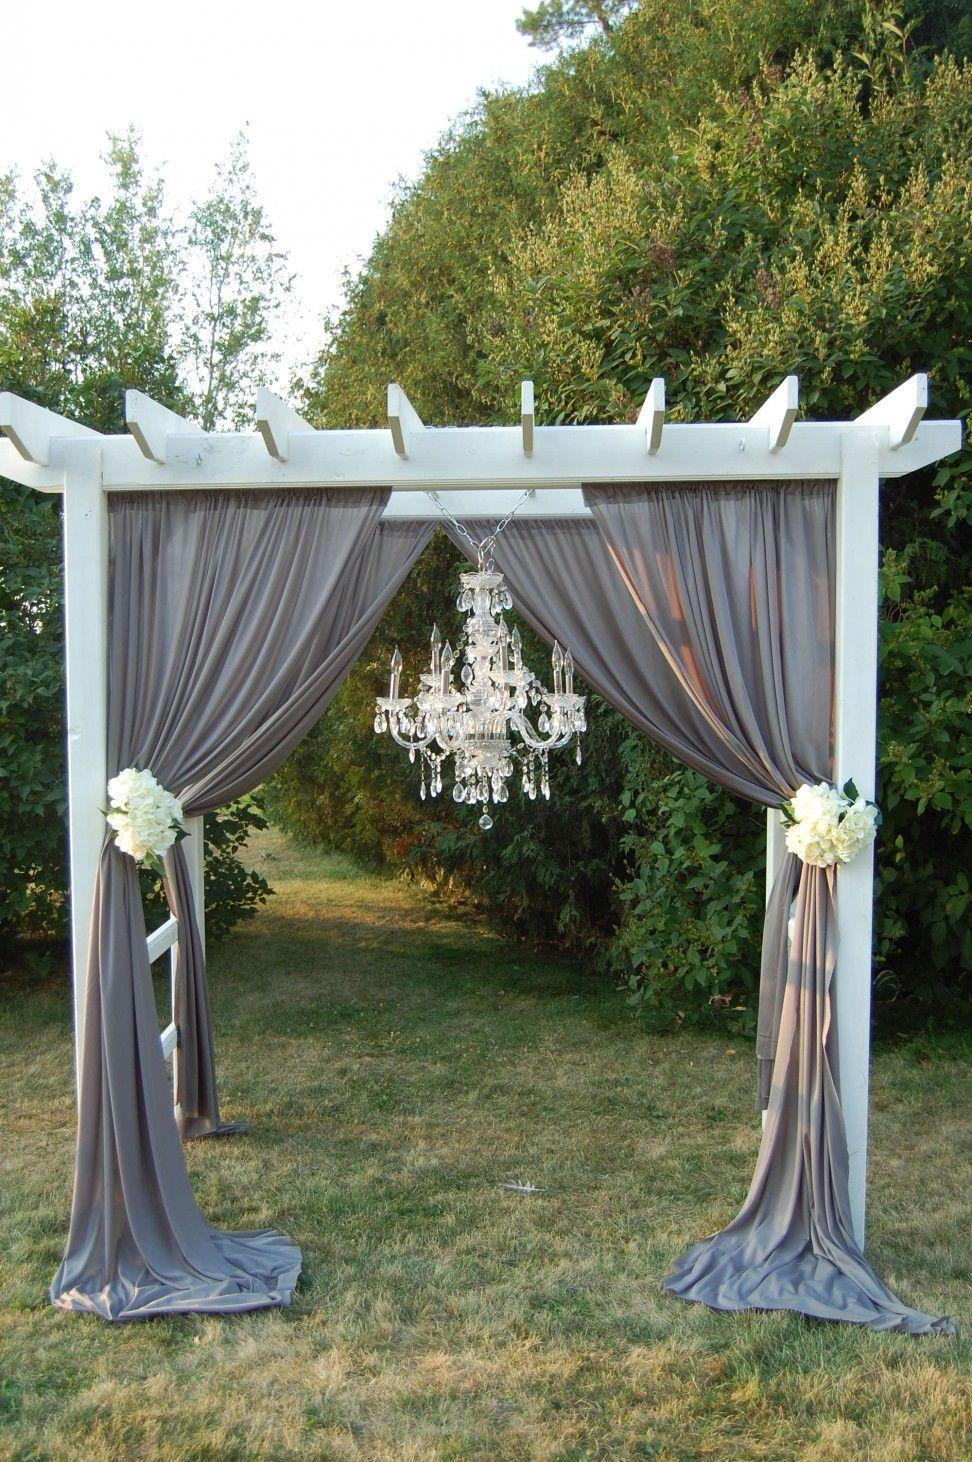 decorating ideas. cool ideas of wedding pergola decorations. white